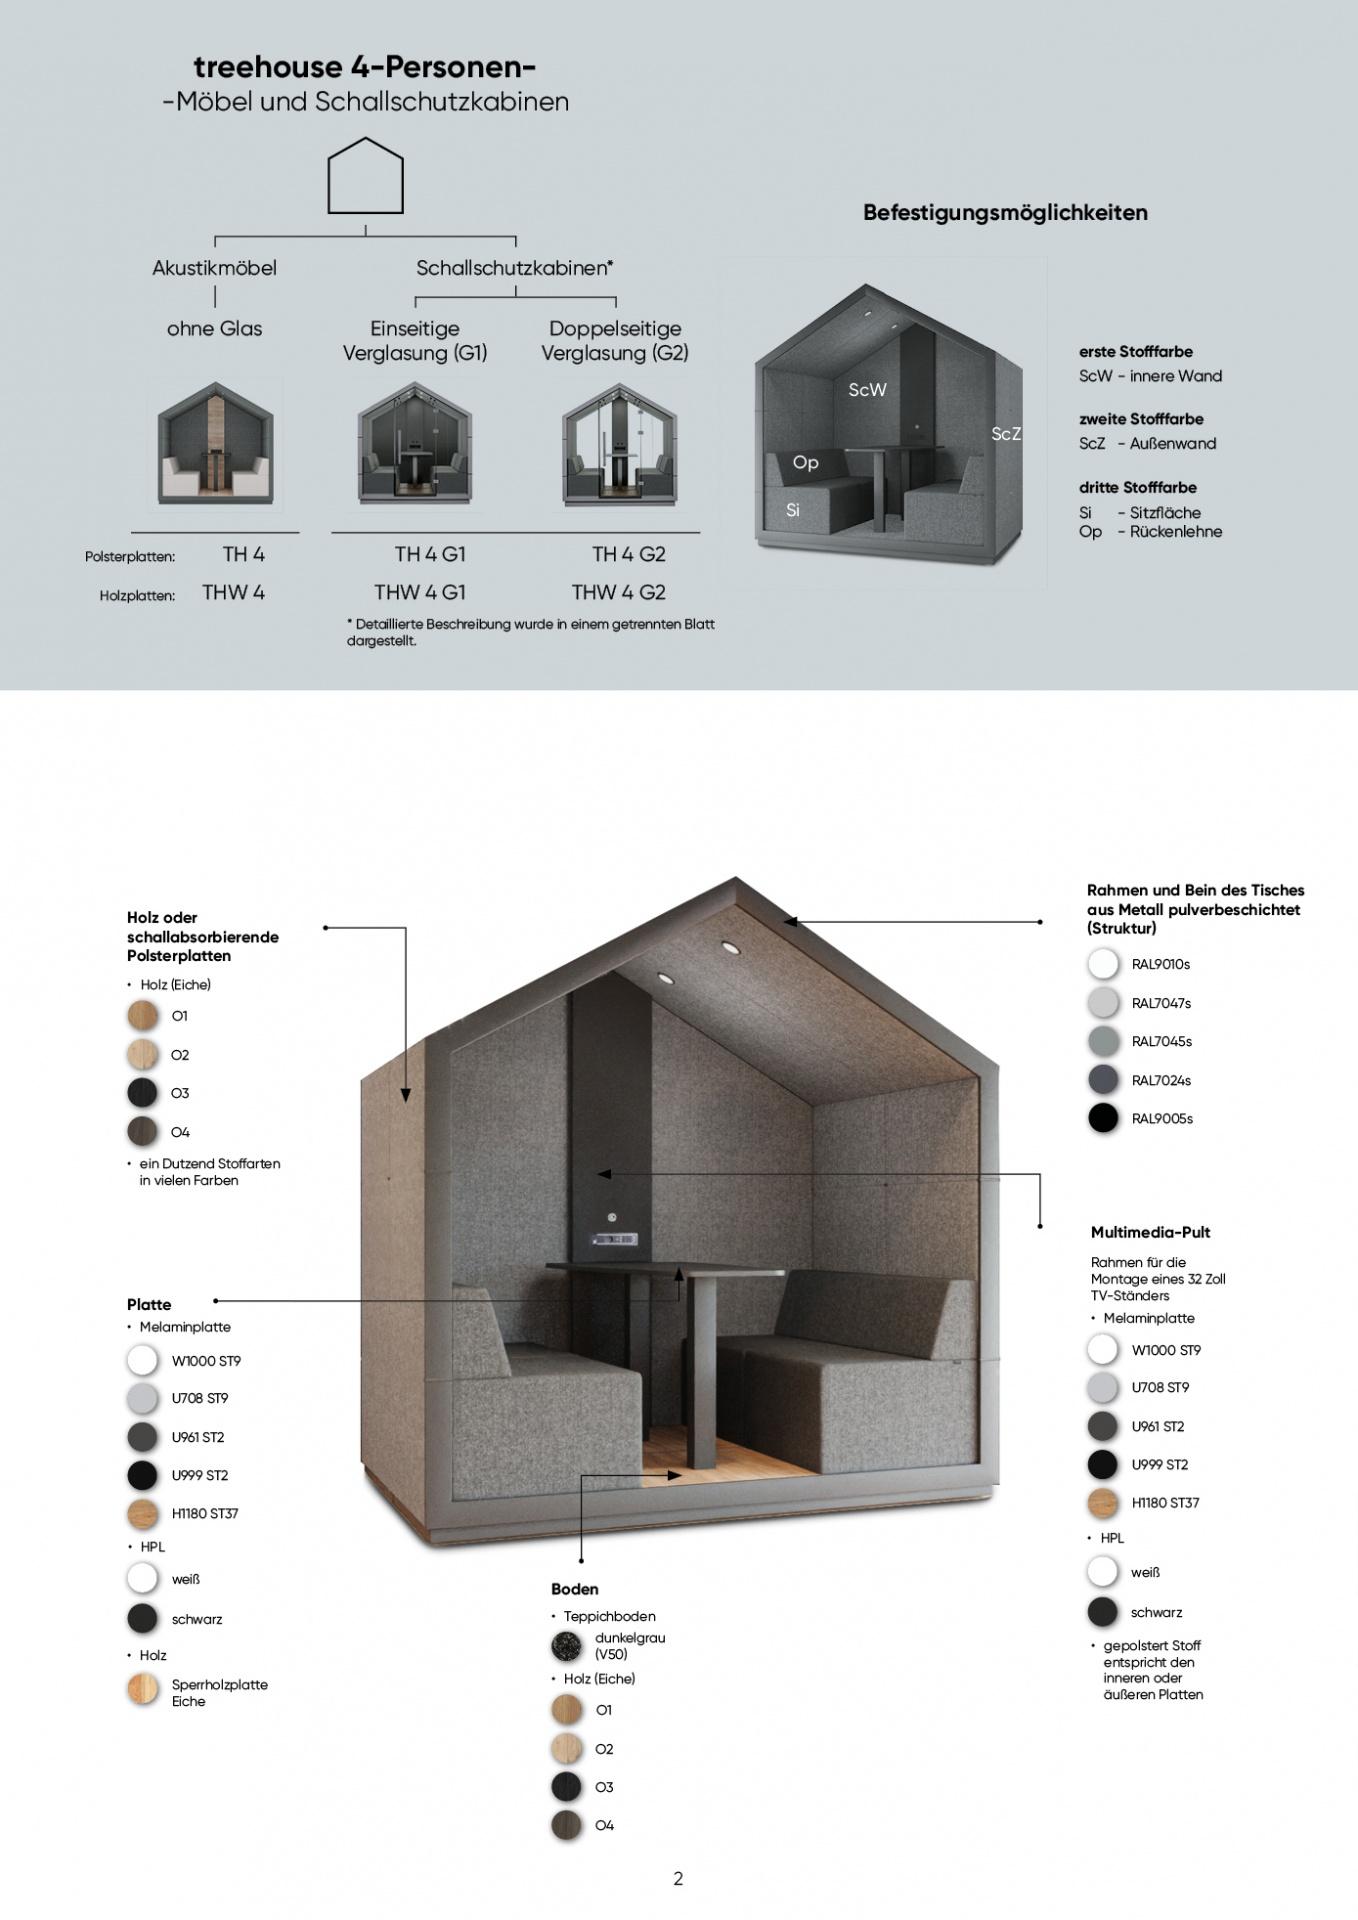 treehouse-akustik-moebel-4-person2.jpg